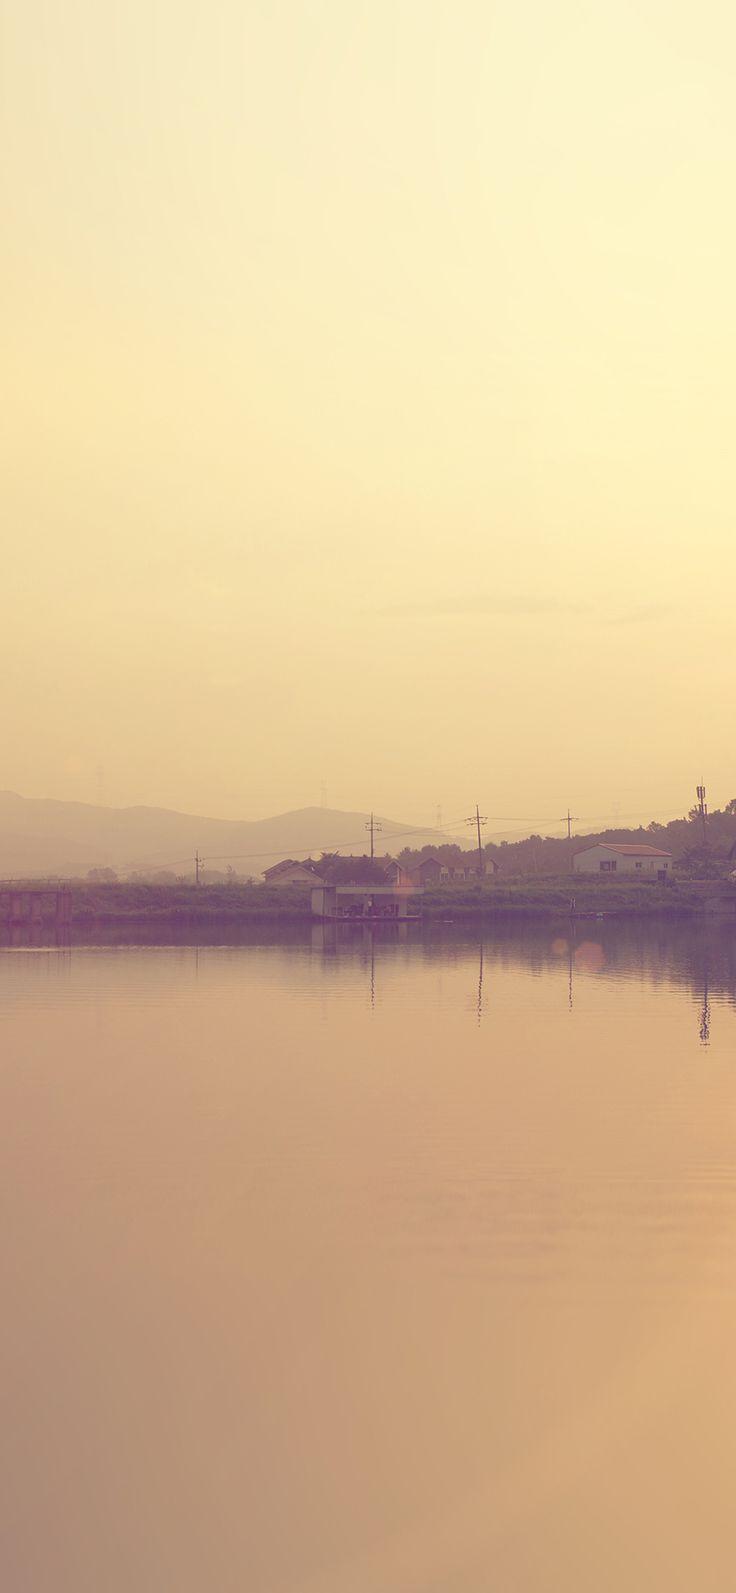 Iphone X Wallpaper Mq85 Lake Nice Sea Ocean Nature Sunset